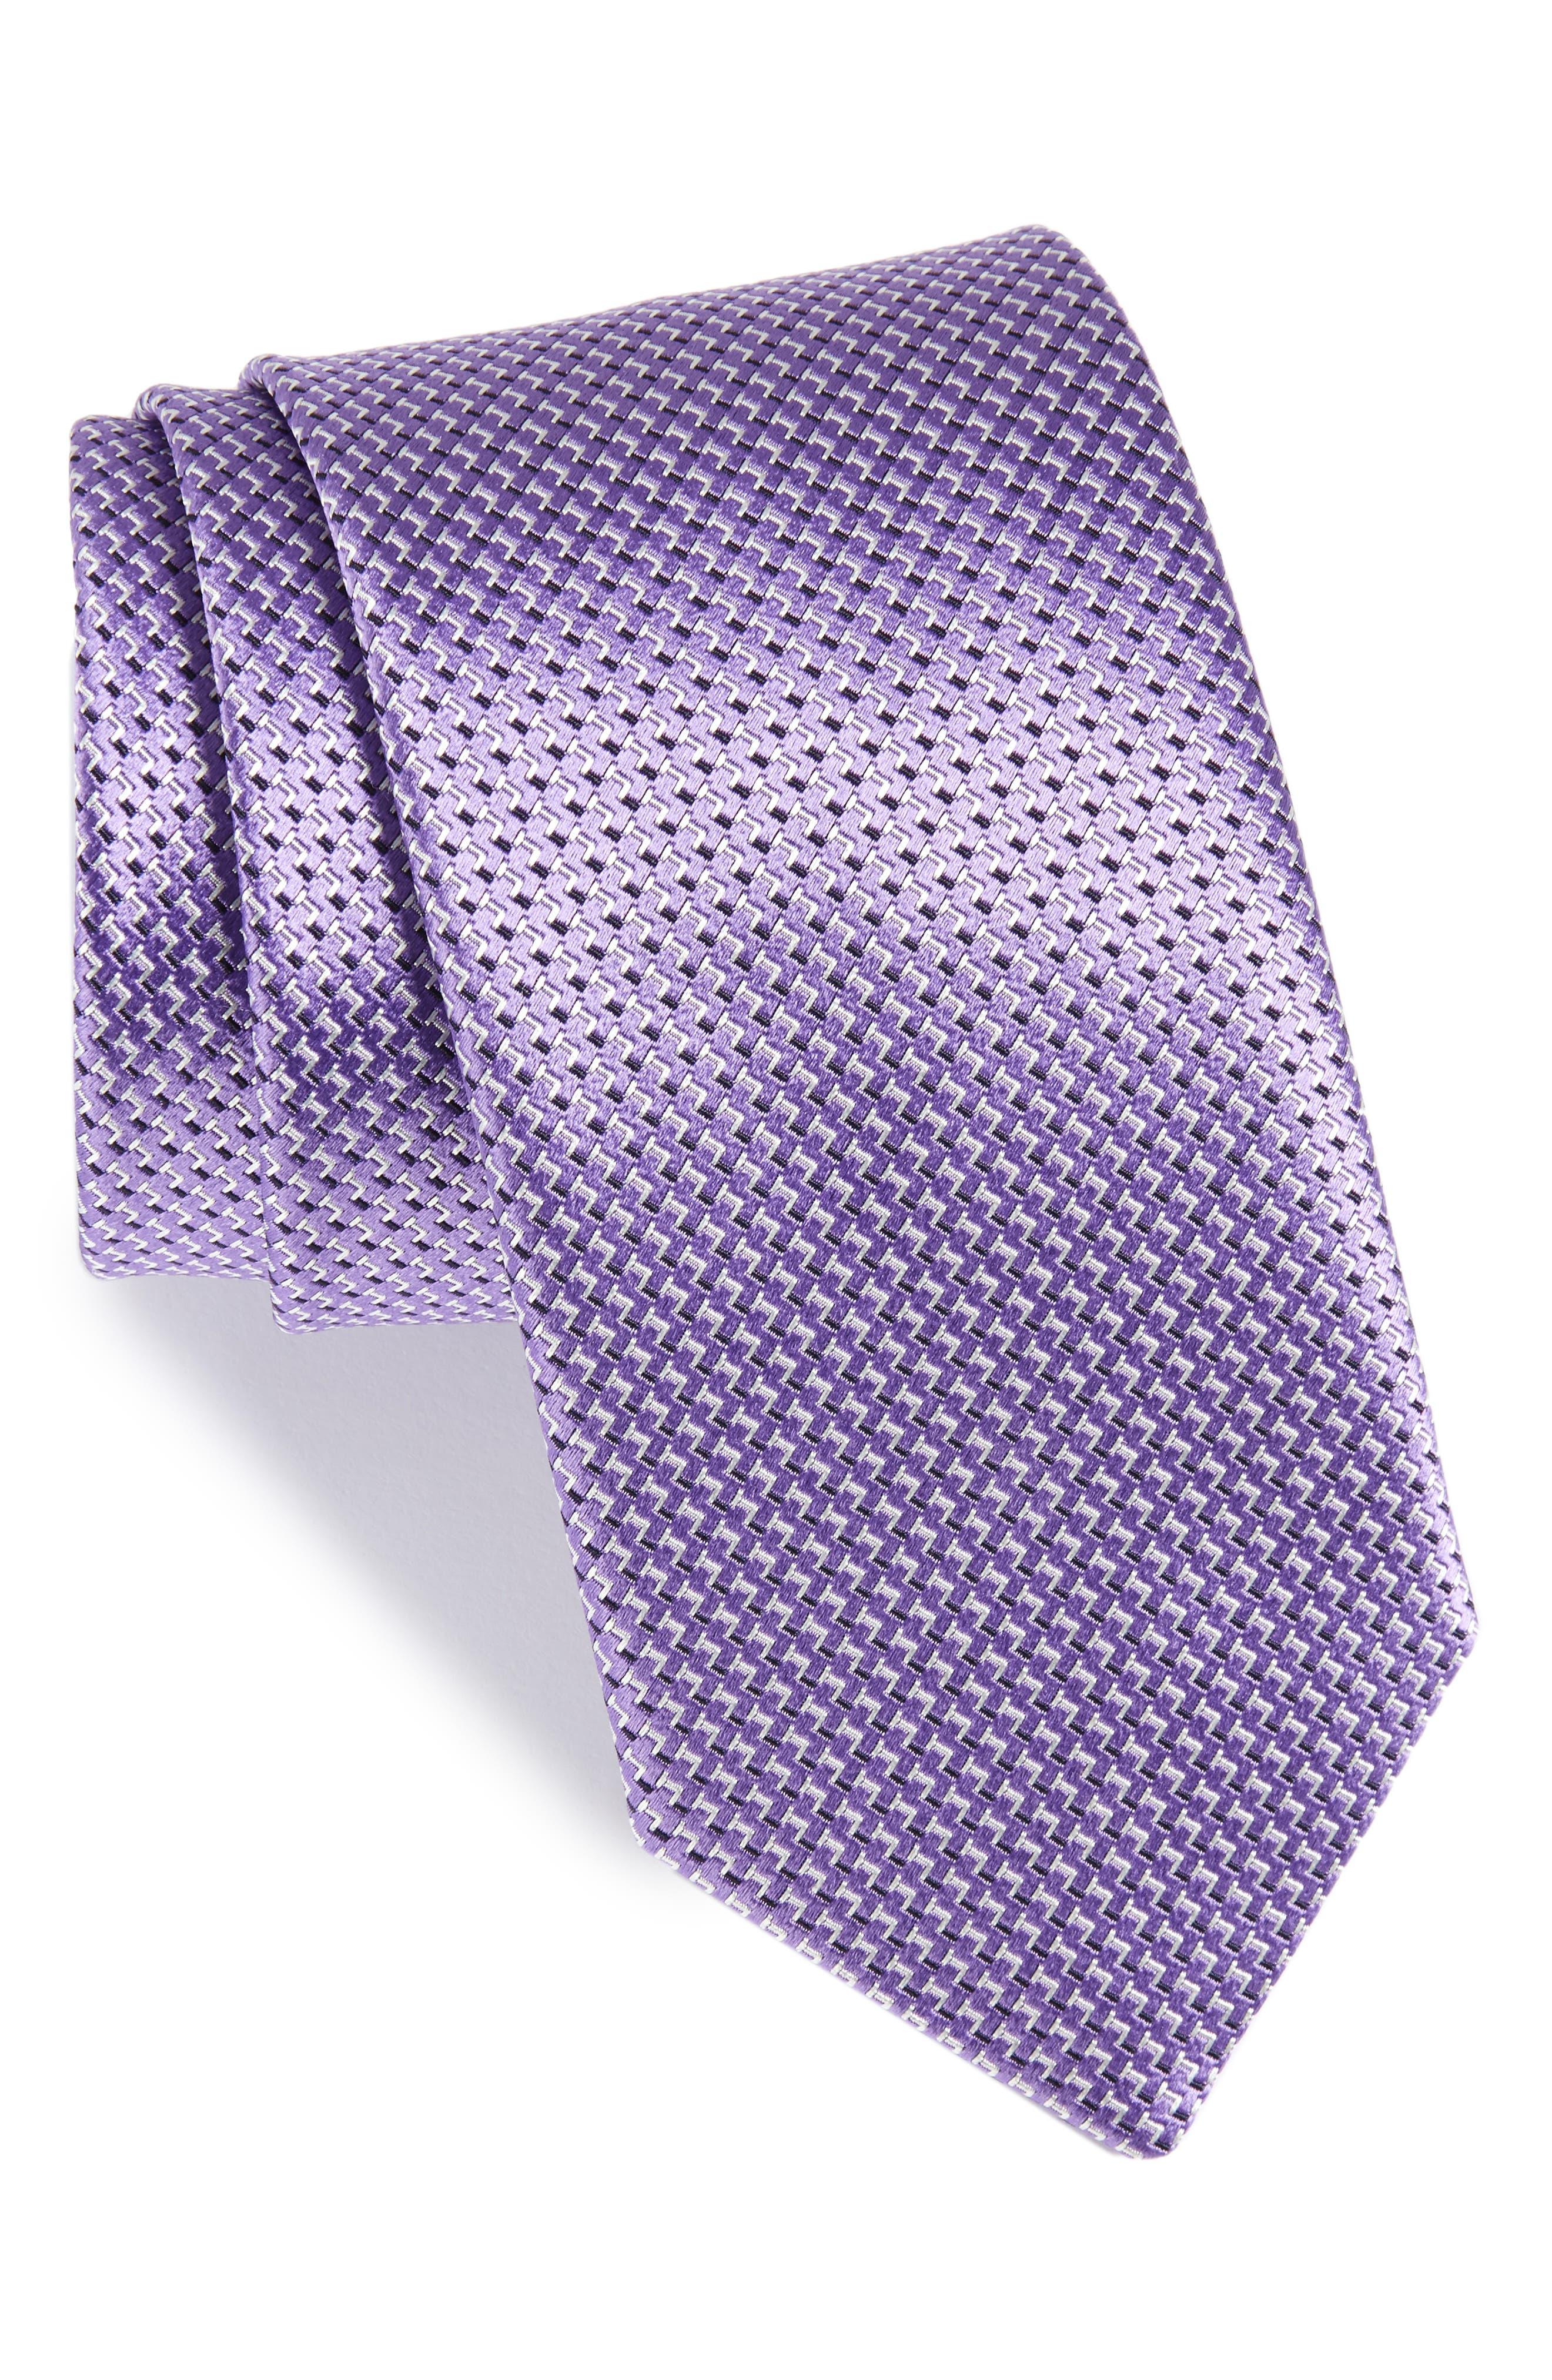 Main Image - Canali Solid Silk Tie